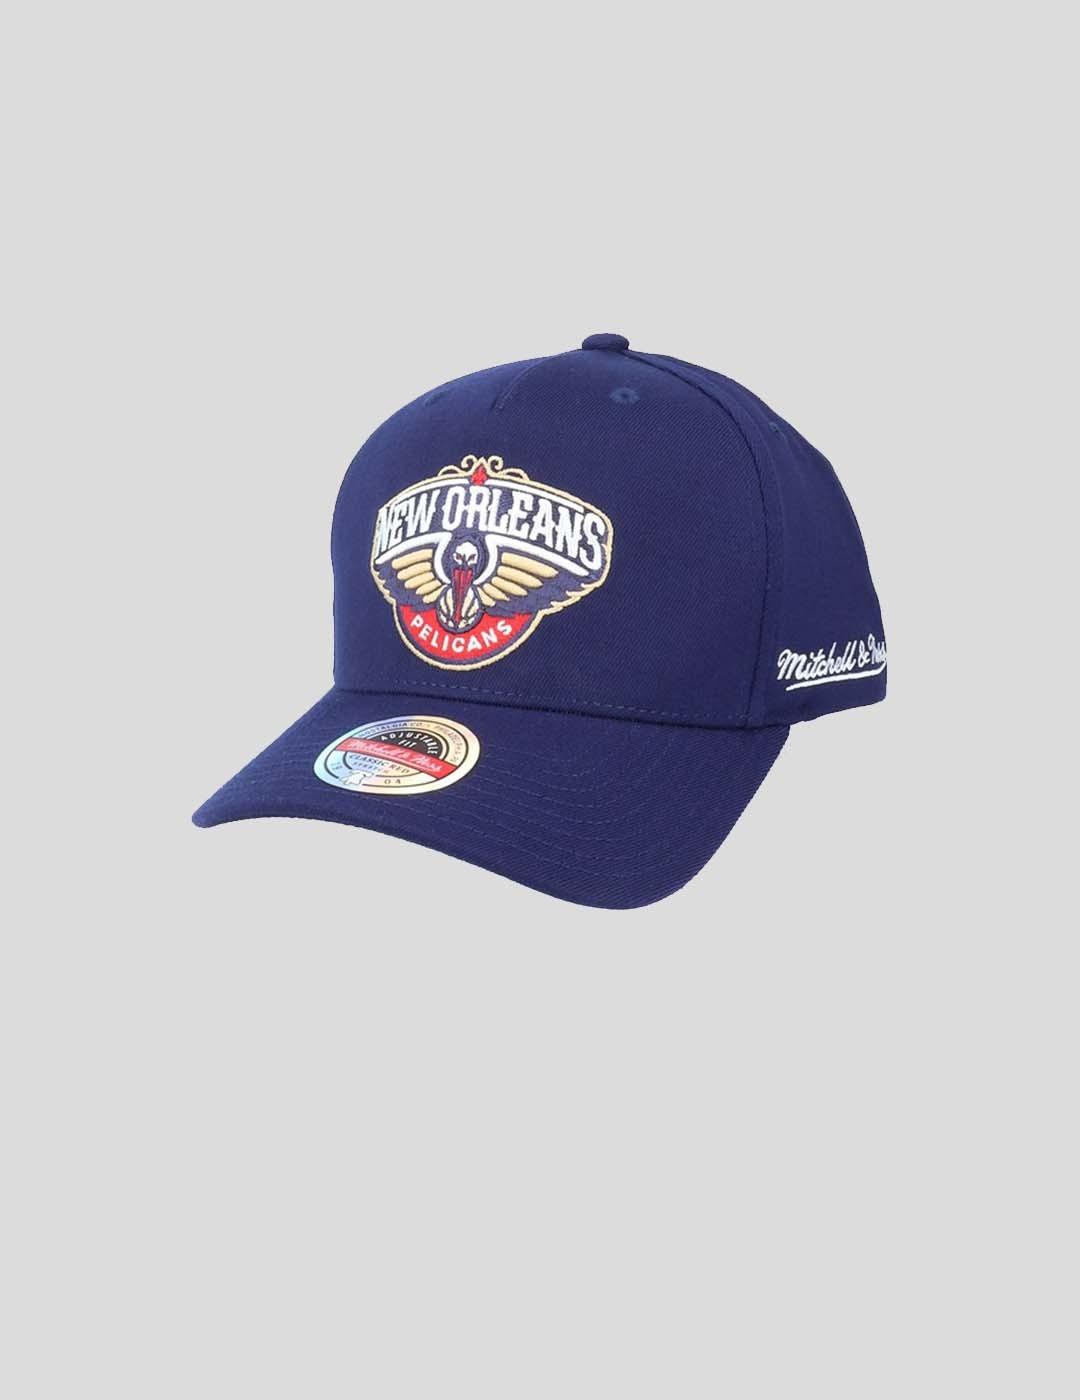 GORRA MITCHELL & NESS NBA DROPBACK SOLID SNAPBACK PELICANS NAVY